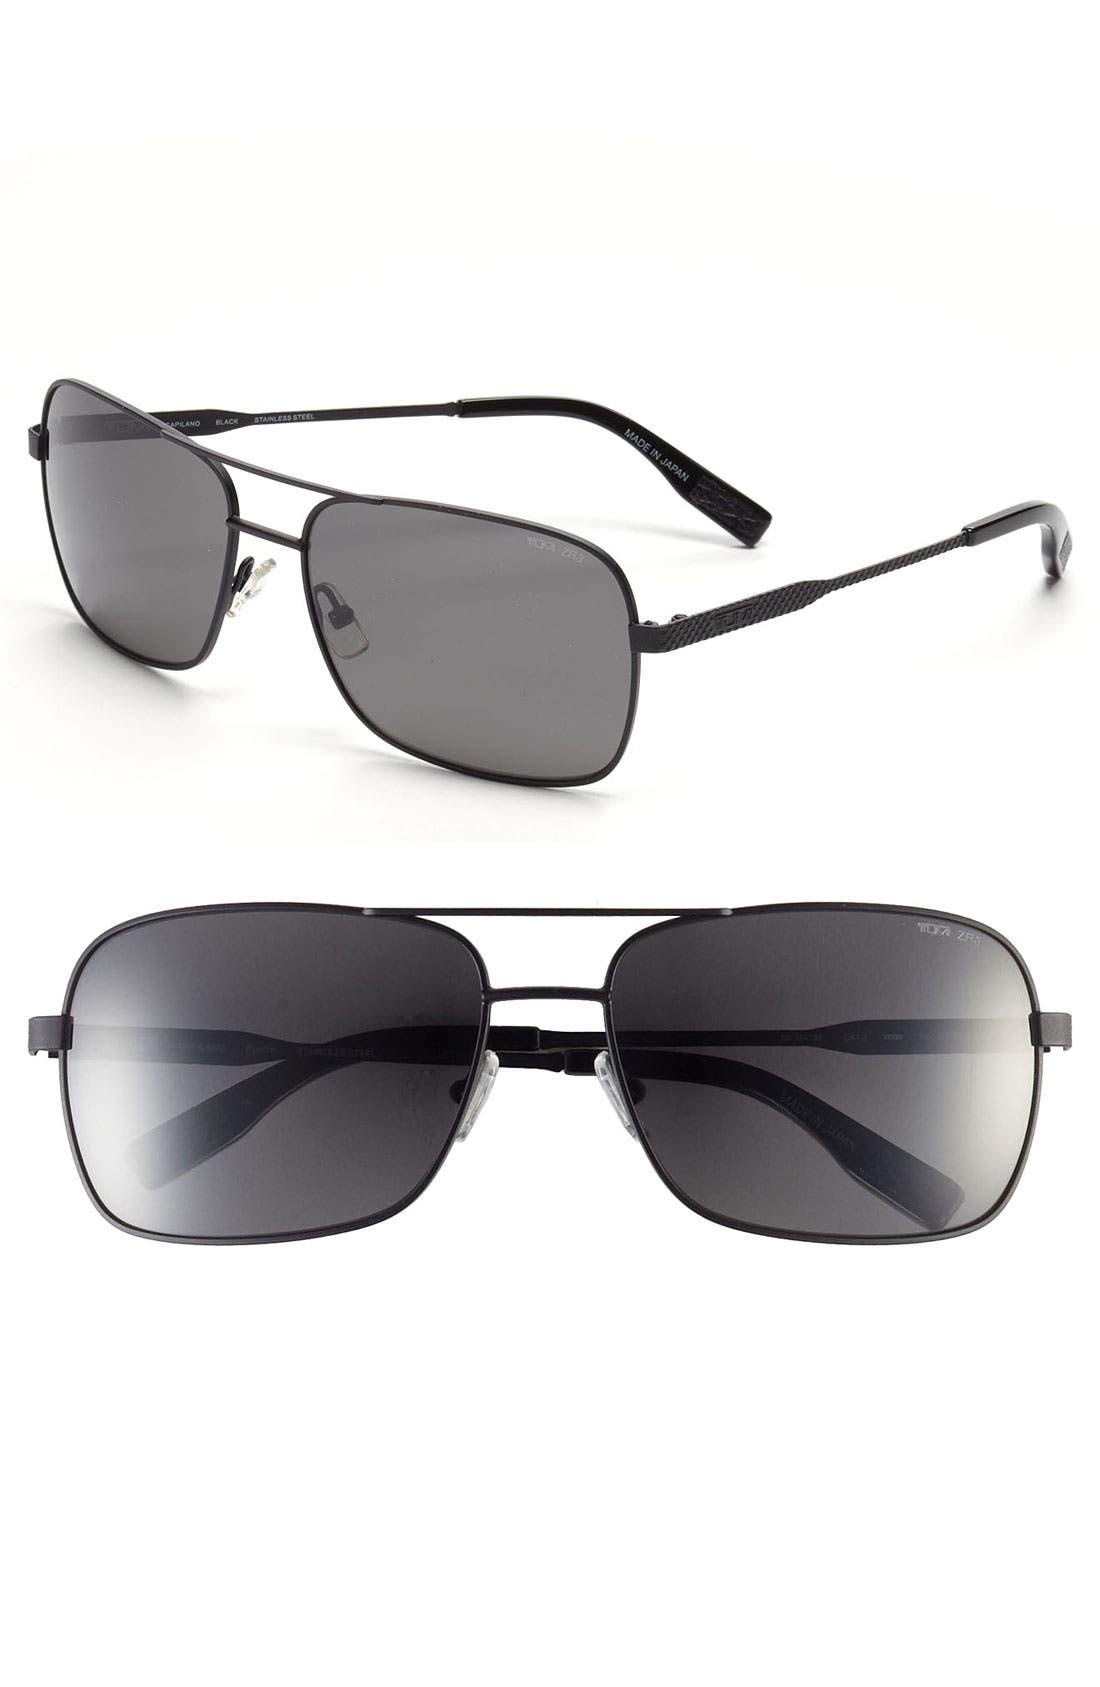 Main Image - Tumi 'Capilano' 59mm Polarized Sunglasses